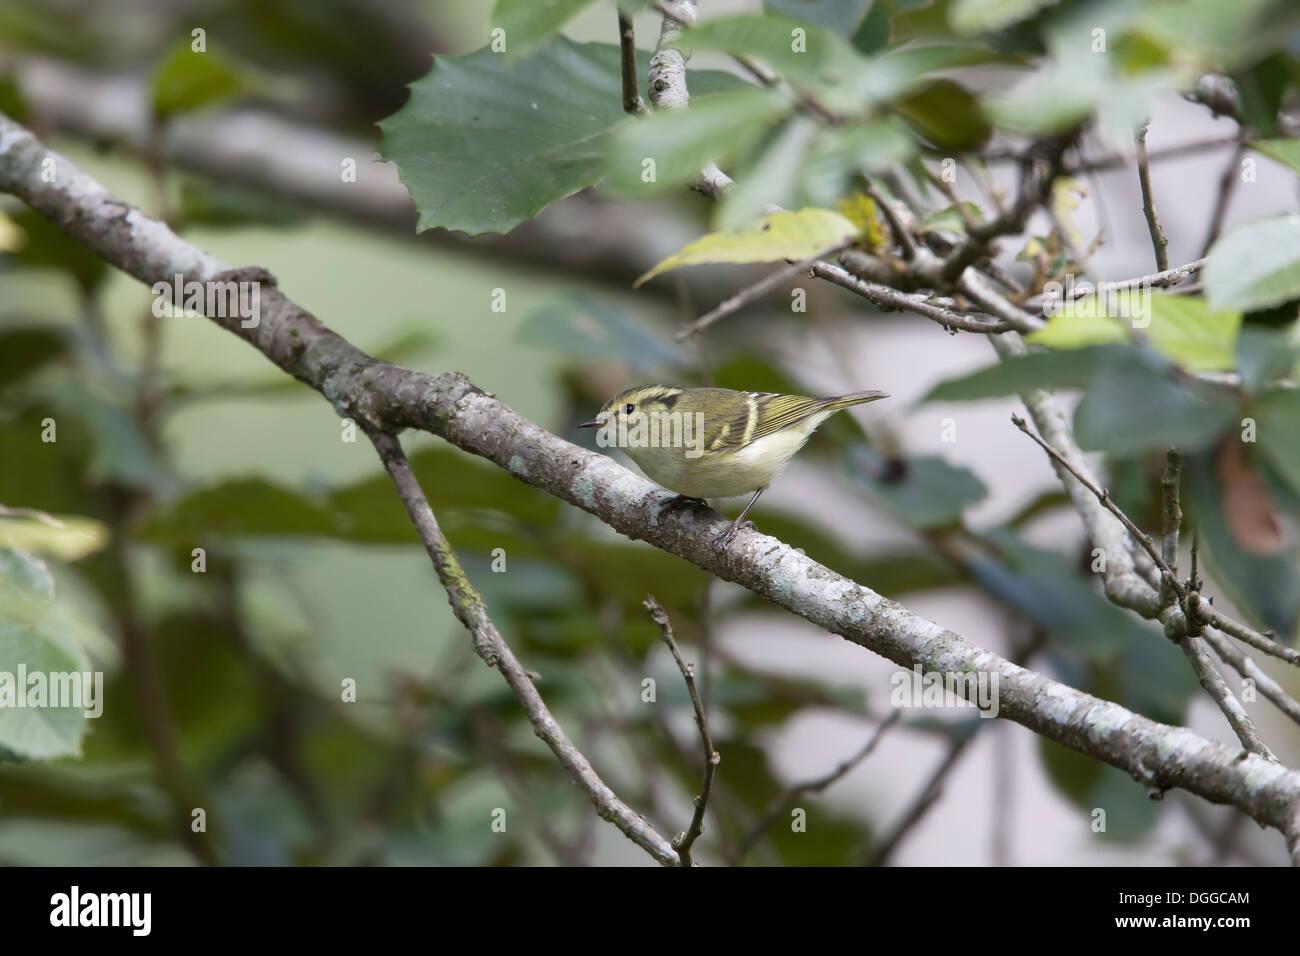 Lemon-rumped Warbler (Phylloscopus chloronotus) adult perched on twig Godavari Botanical Gardens Kathmandu Kathmandu Stock Photo